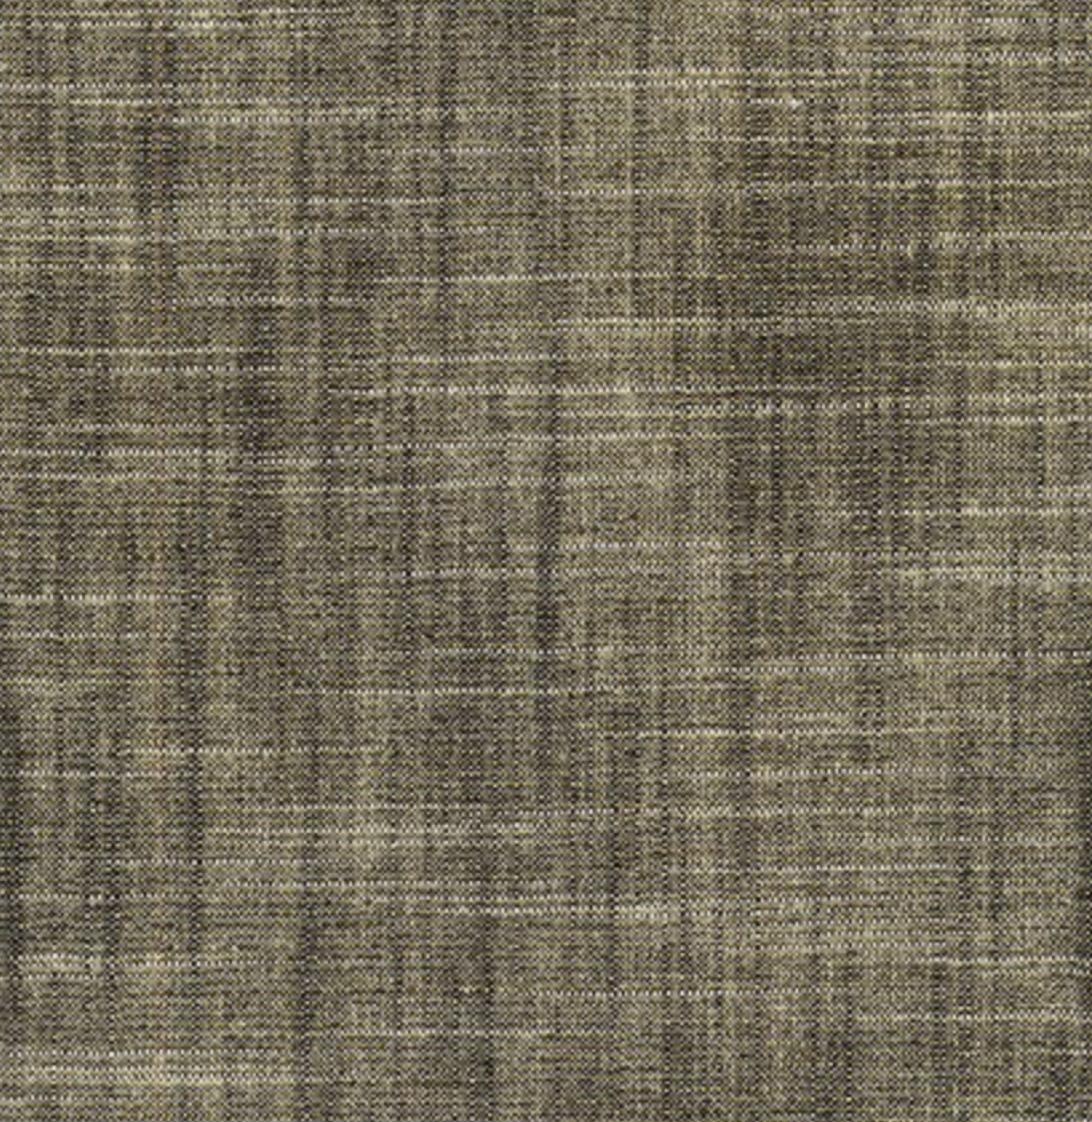 Ebony - Manchester Metallic Cotton/Lurex - Robert Kaufman